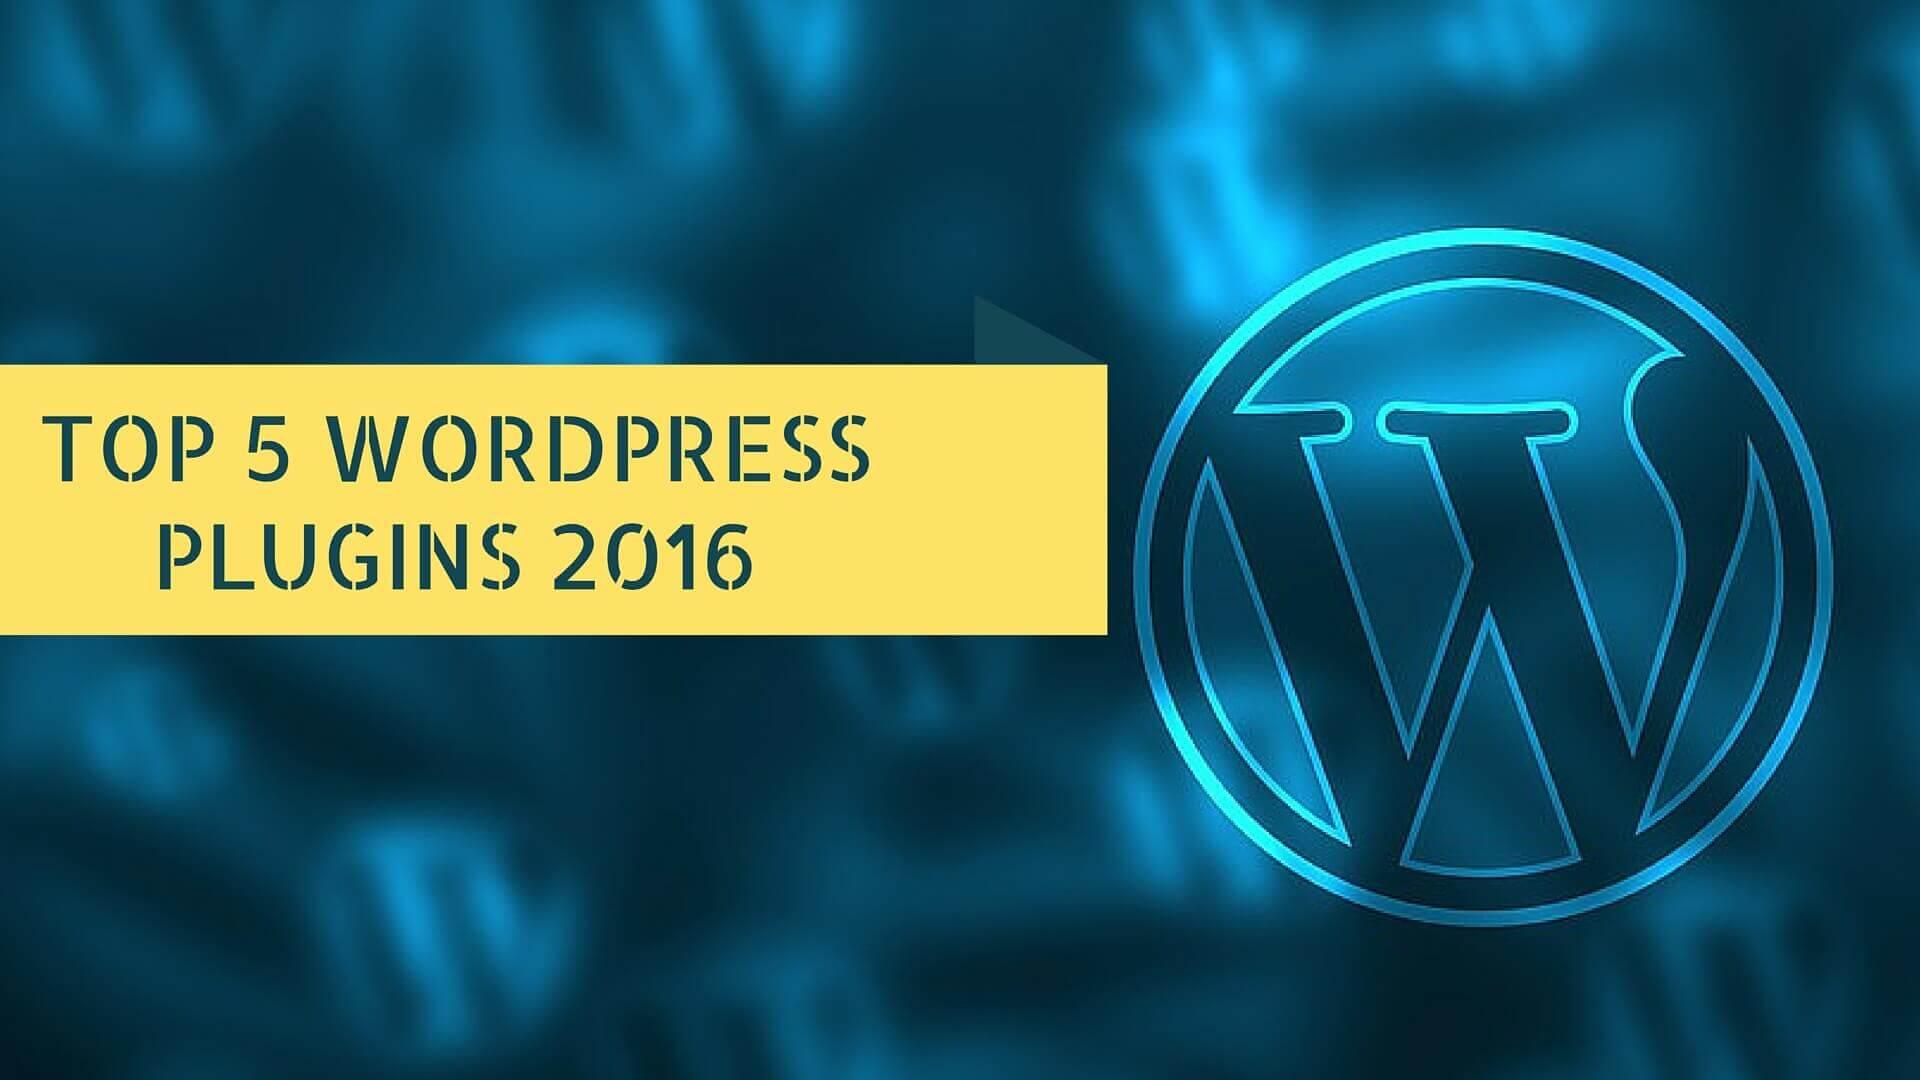 Top 5 wordpress plugins of 2016 featured image